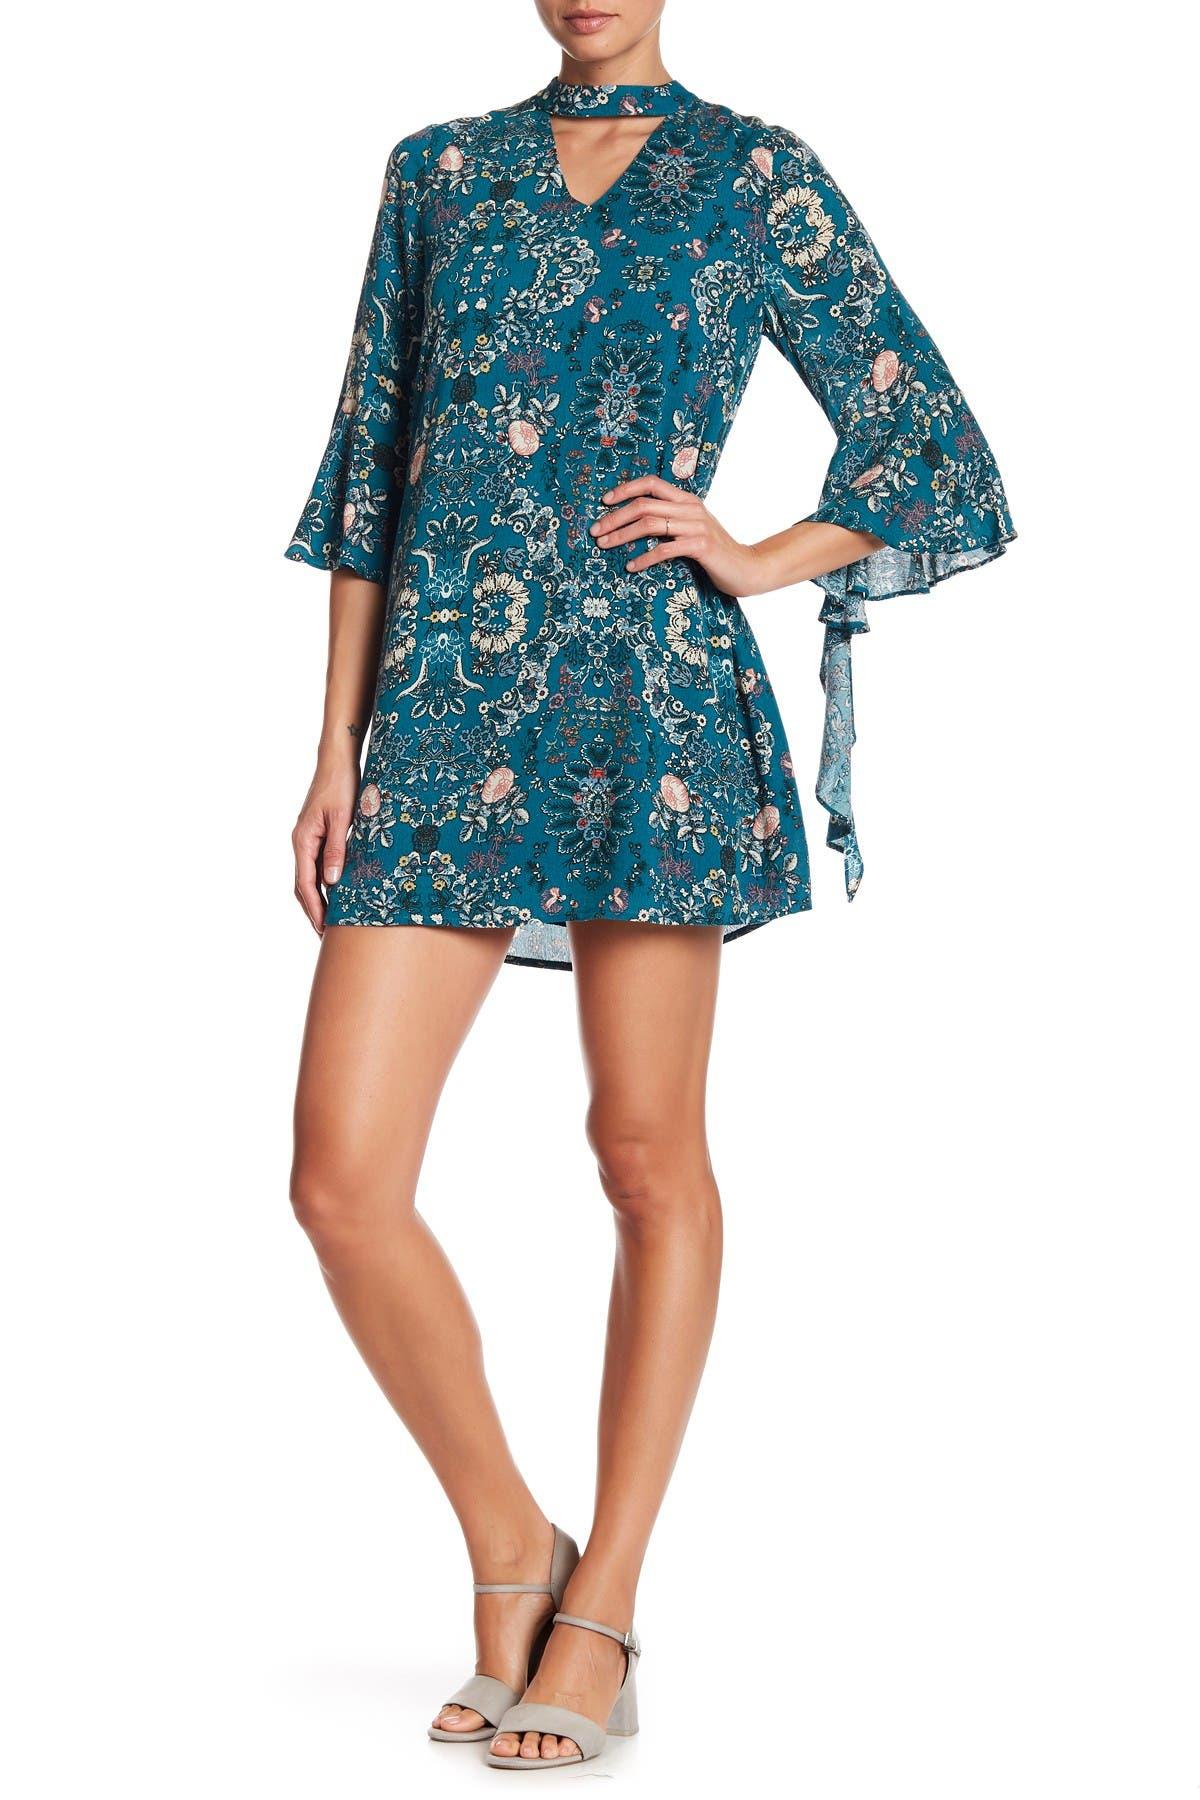 Image of Blu Pepper Mock Collar Cutout Floral Dress